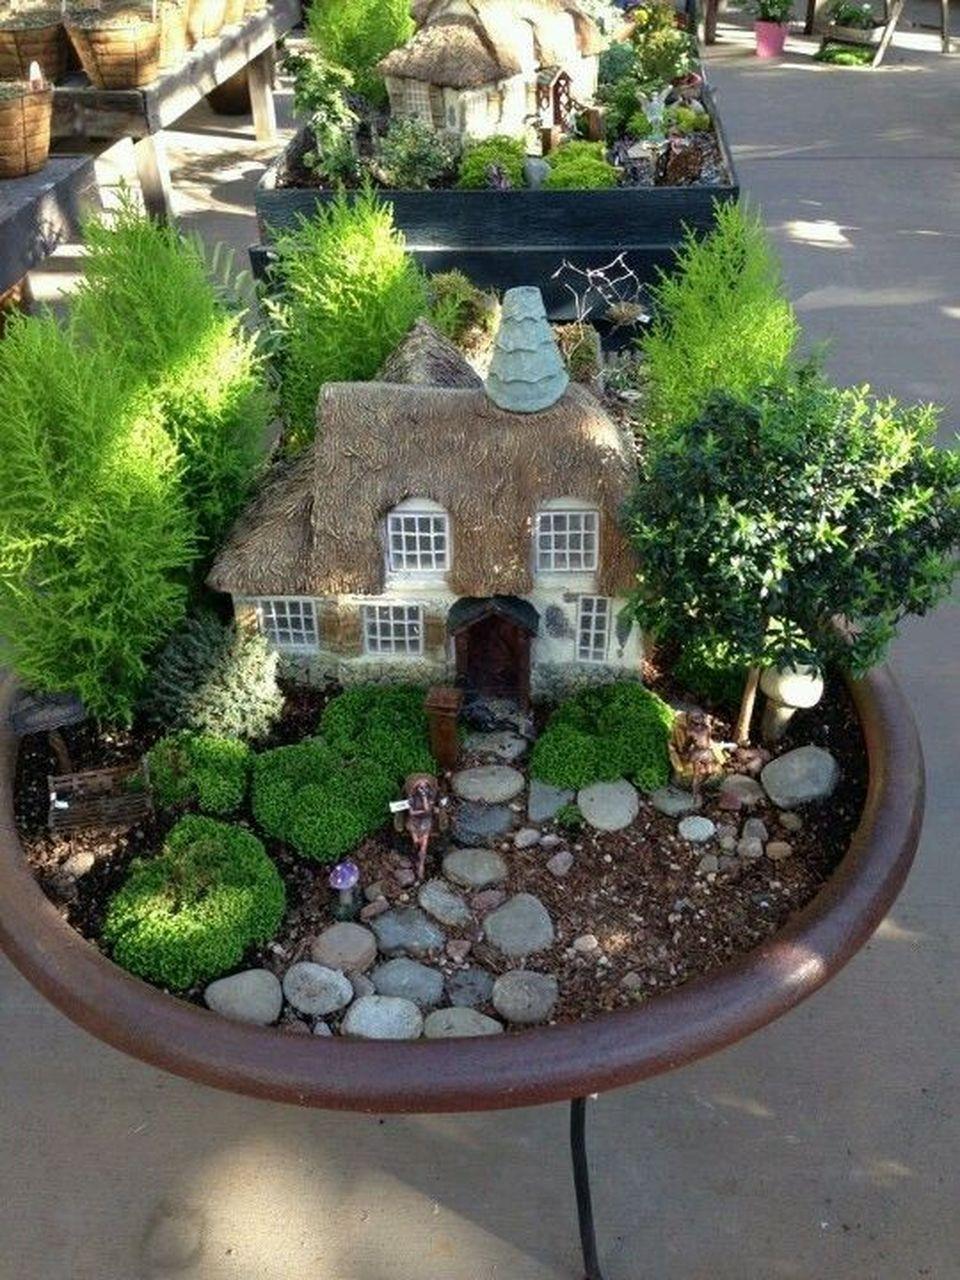 Amazing Diy Mini Fairy Garden For Miniature Landscaping 82 Sadovye Idei Miniatyurnyj Sad Sad V Gorshke